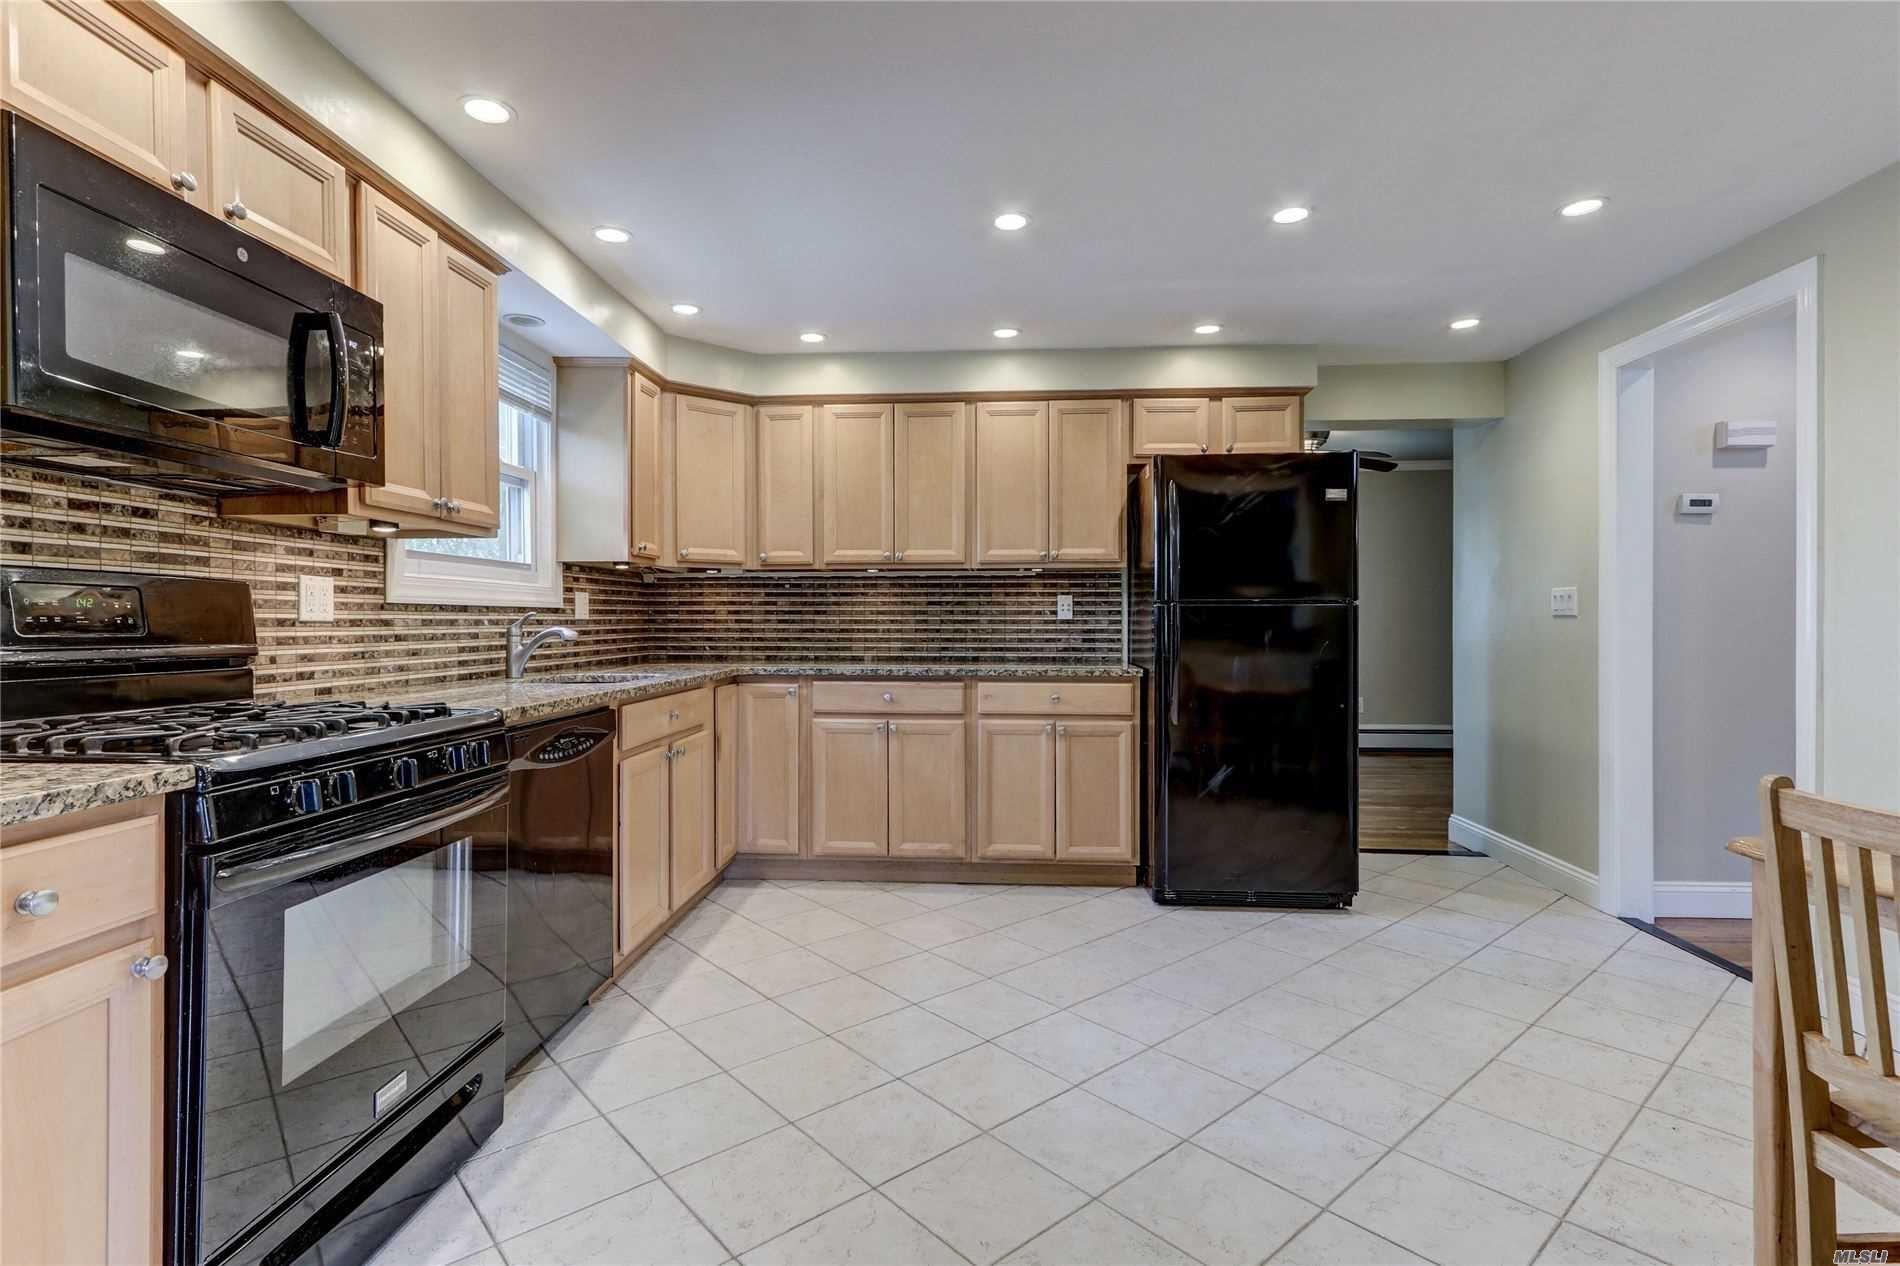 45 King Street, Malverne, NY 11565 - MLS#: 3216672